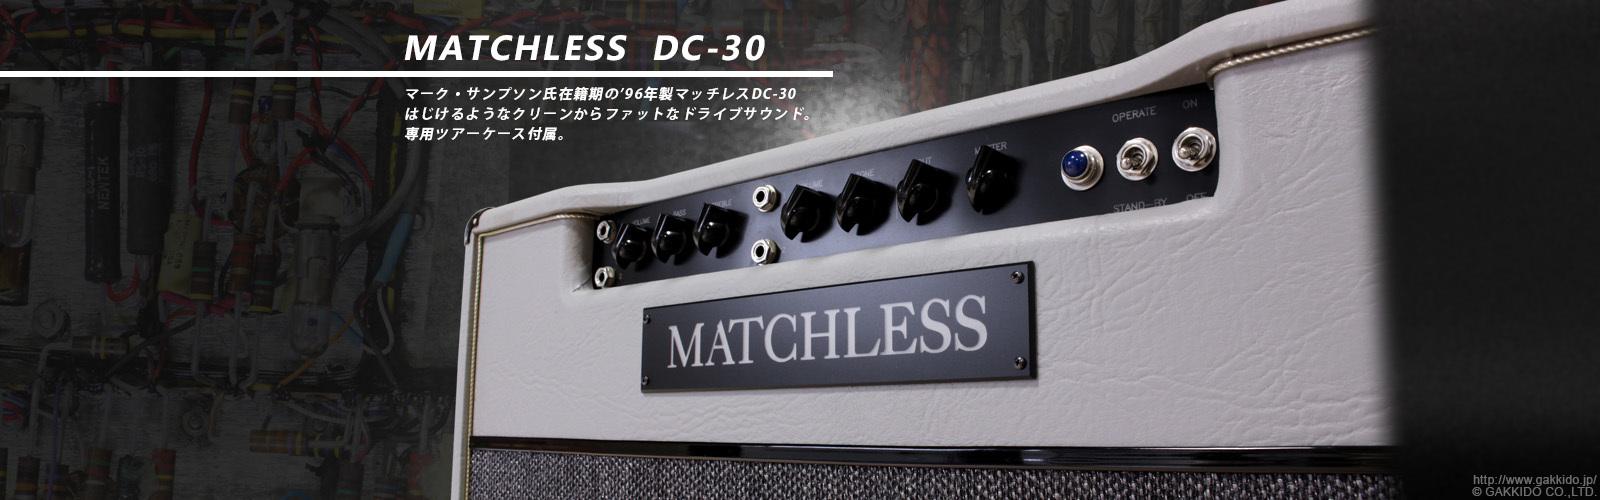 Matchless 1996 DC-30 Gray ギターアンプ コンボ [ツアーケース付き] [中古品]